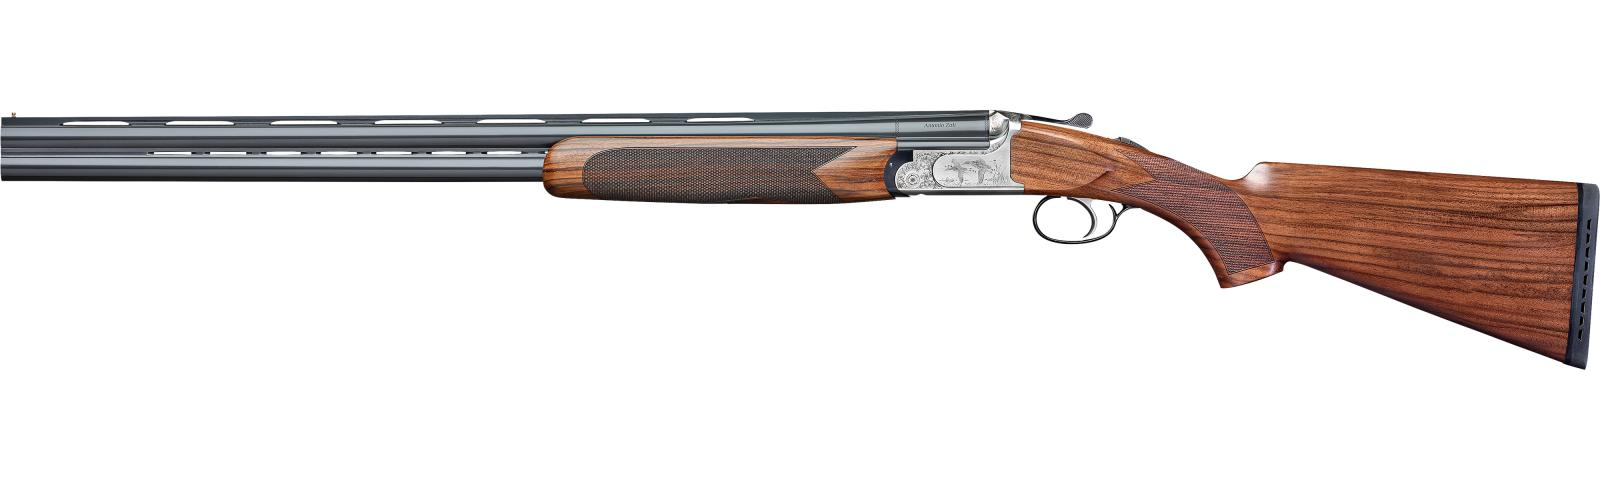 Fusil superposé ZOLI Colombus Cal. 20/76